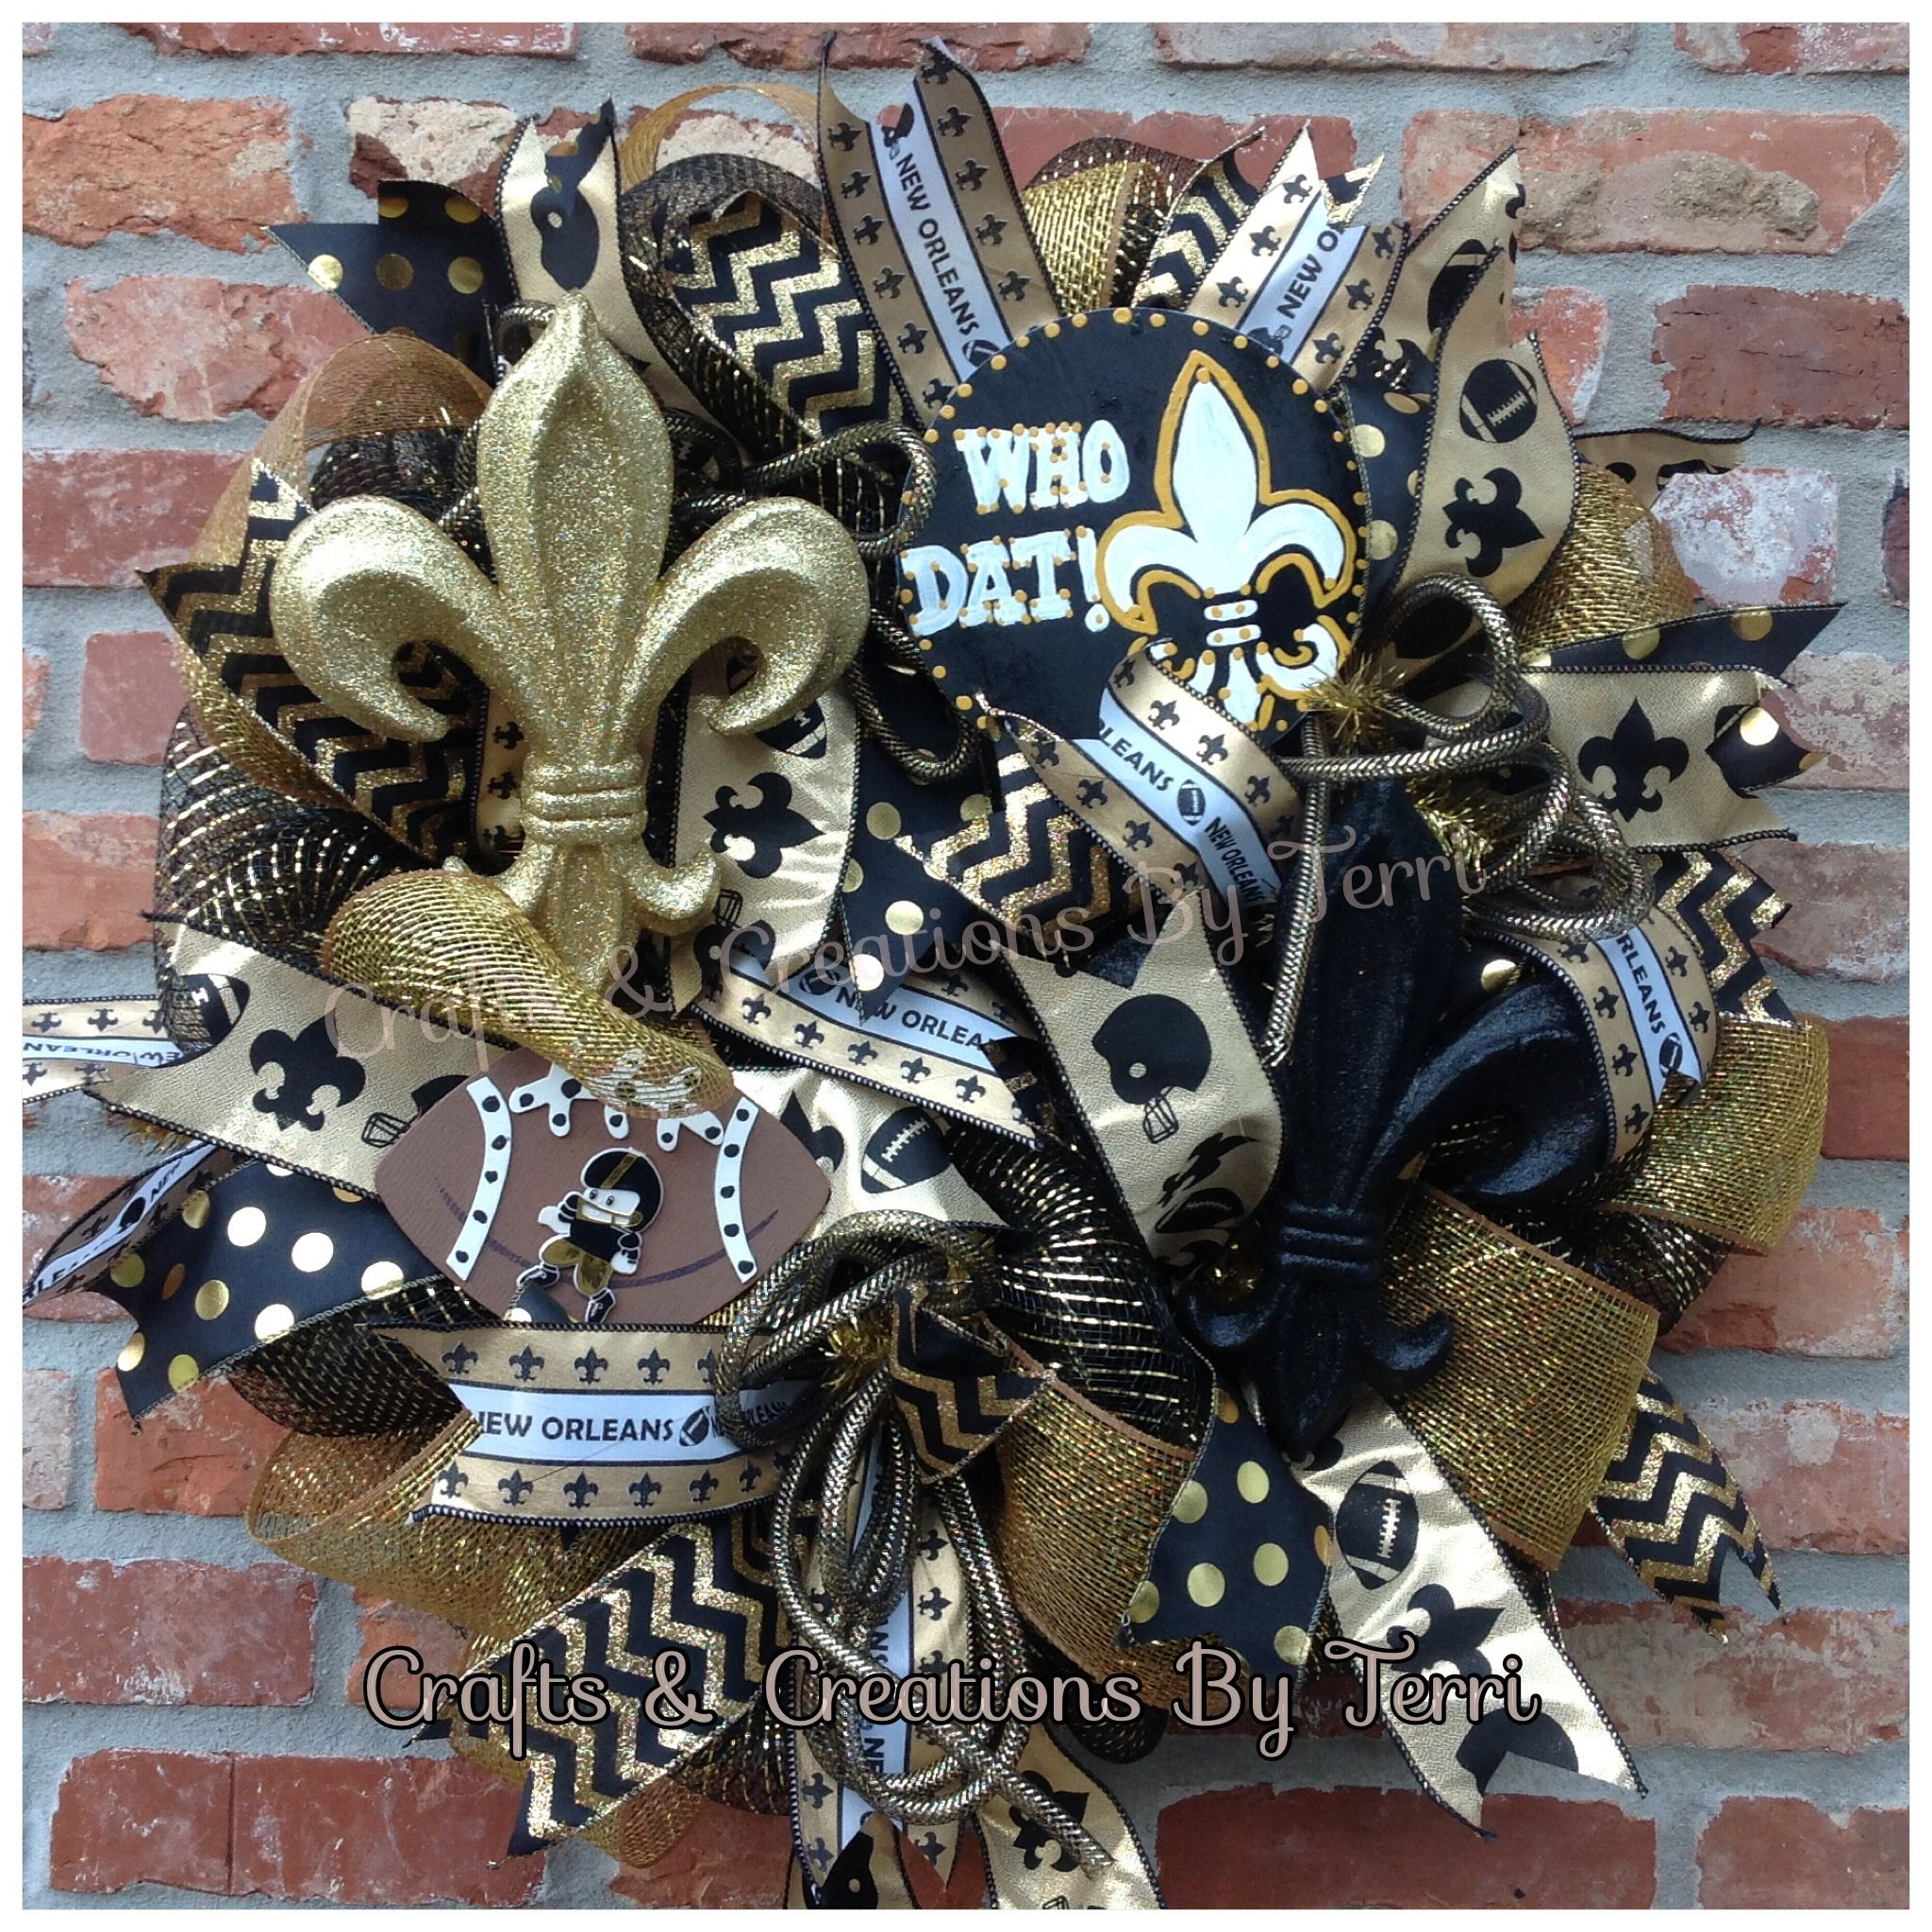 New Orleans Saints football wreath. Follow Created By Terri/Crafts & Creations By Terri www.facebook.com/CraftsandCreationsByTerri  www.etsy.com/shop/CreatedByTerri Instagram @ CreatedByTerri  Twitter @ designsbyterri #craftsandcreationsbyterri #createdbyterri #etsy #doorwreaths #football #saints #neworleans